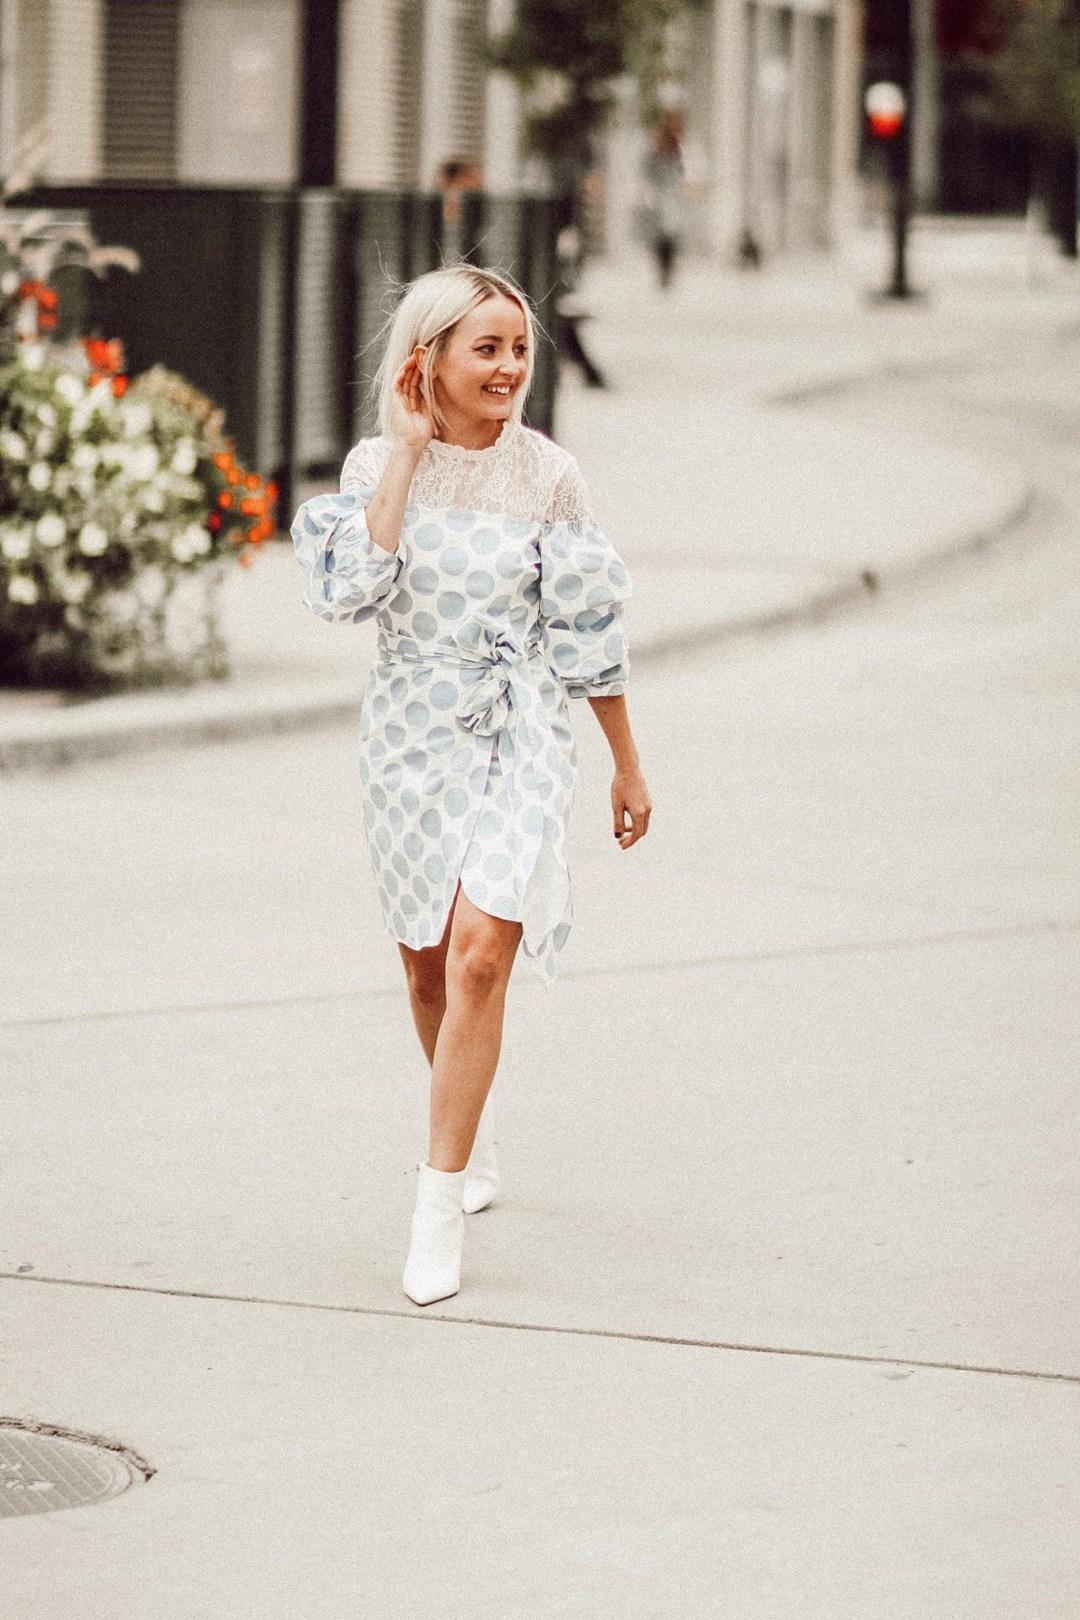 Alena Gidenko of modaprints.com shares her love for lace long sleeve tops